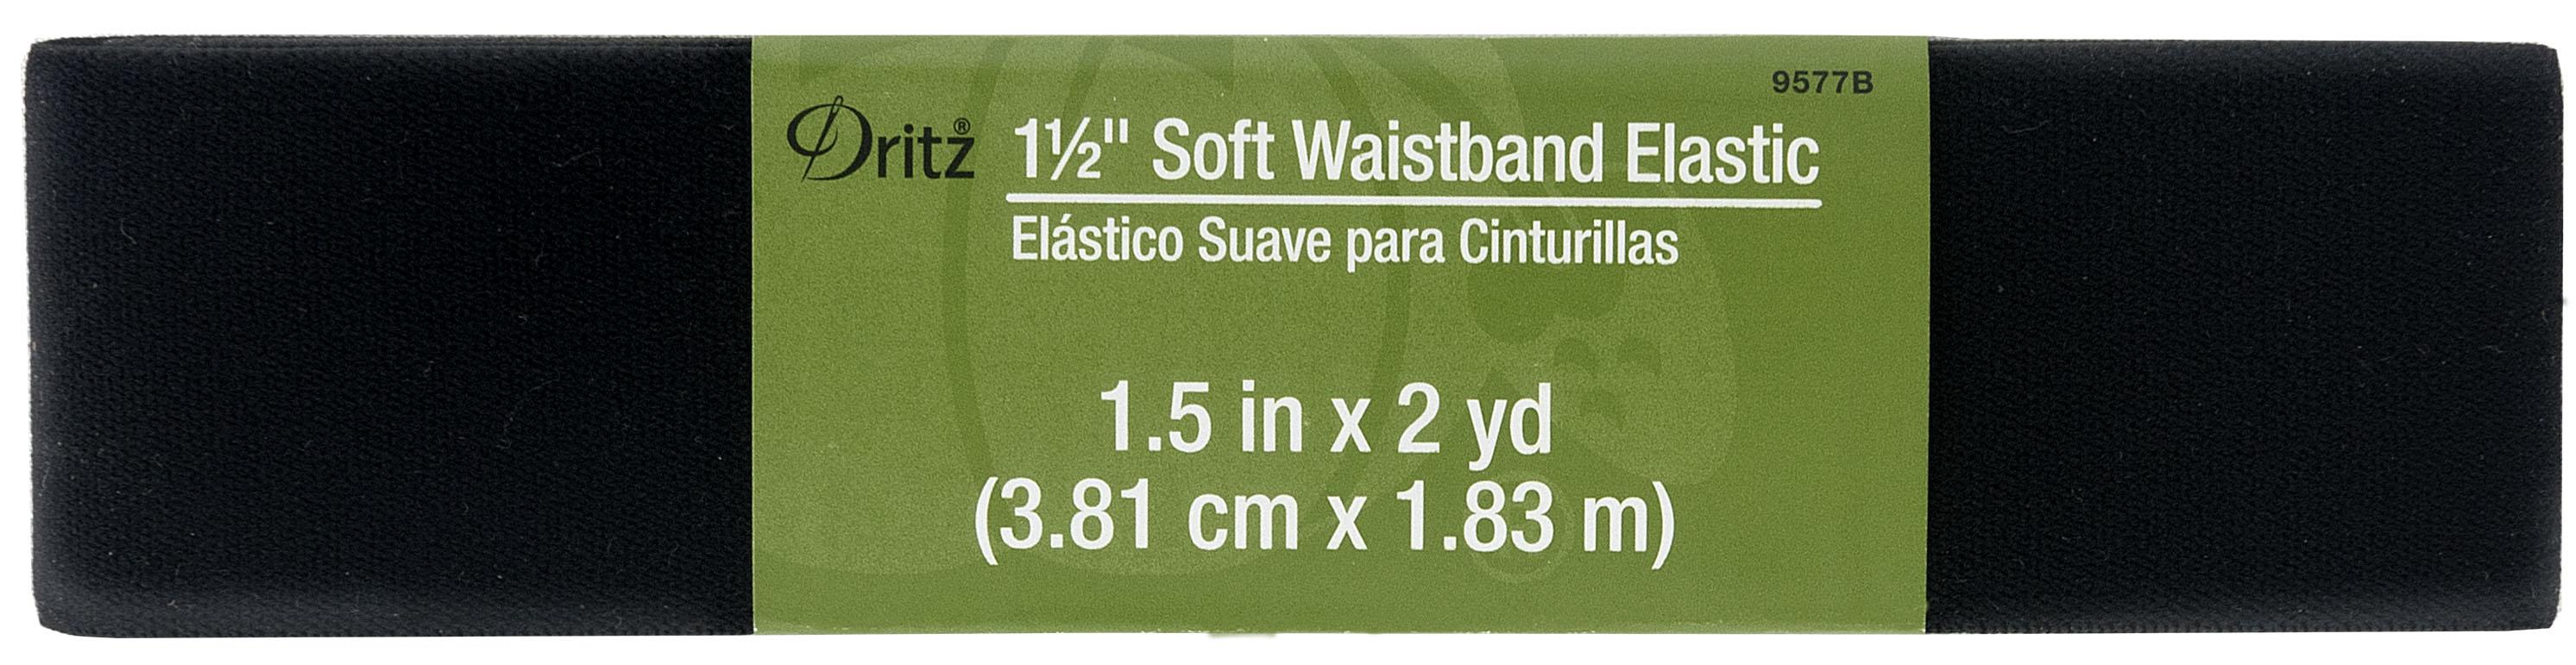 1 1/2 Inch Soft Waistband Elastic - Black